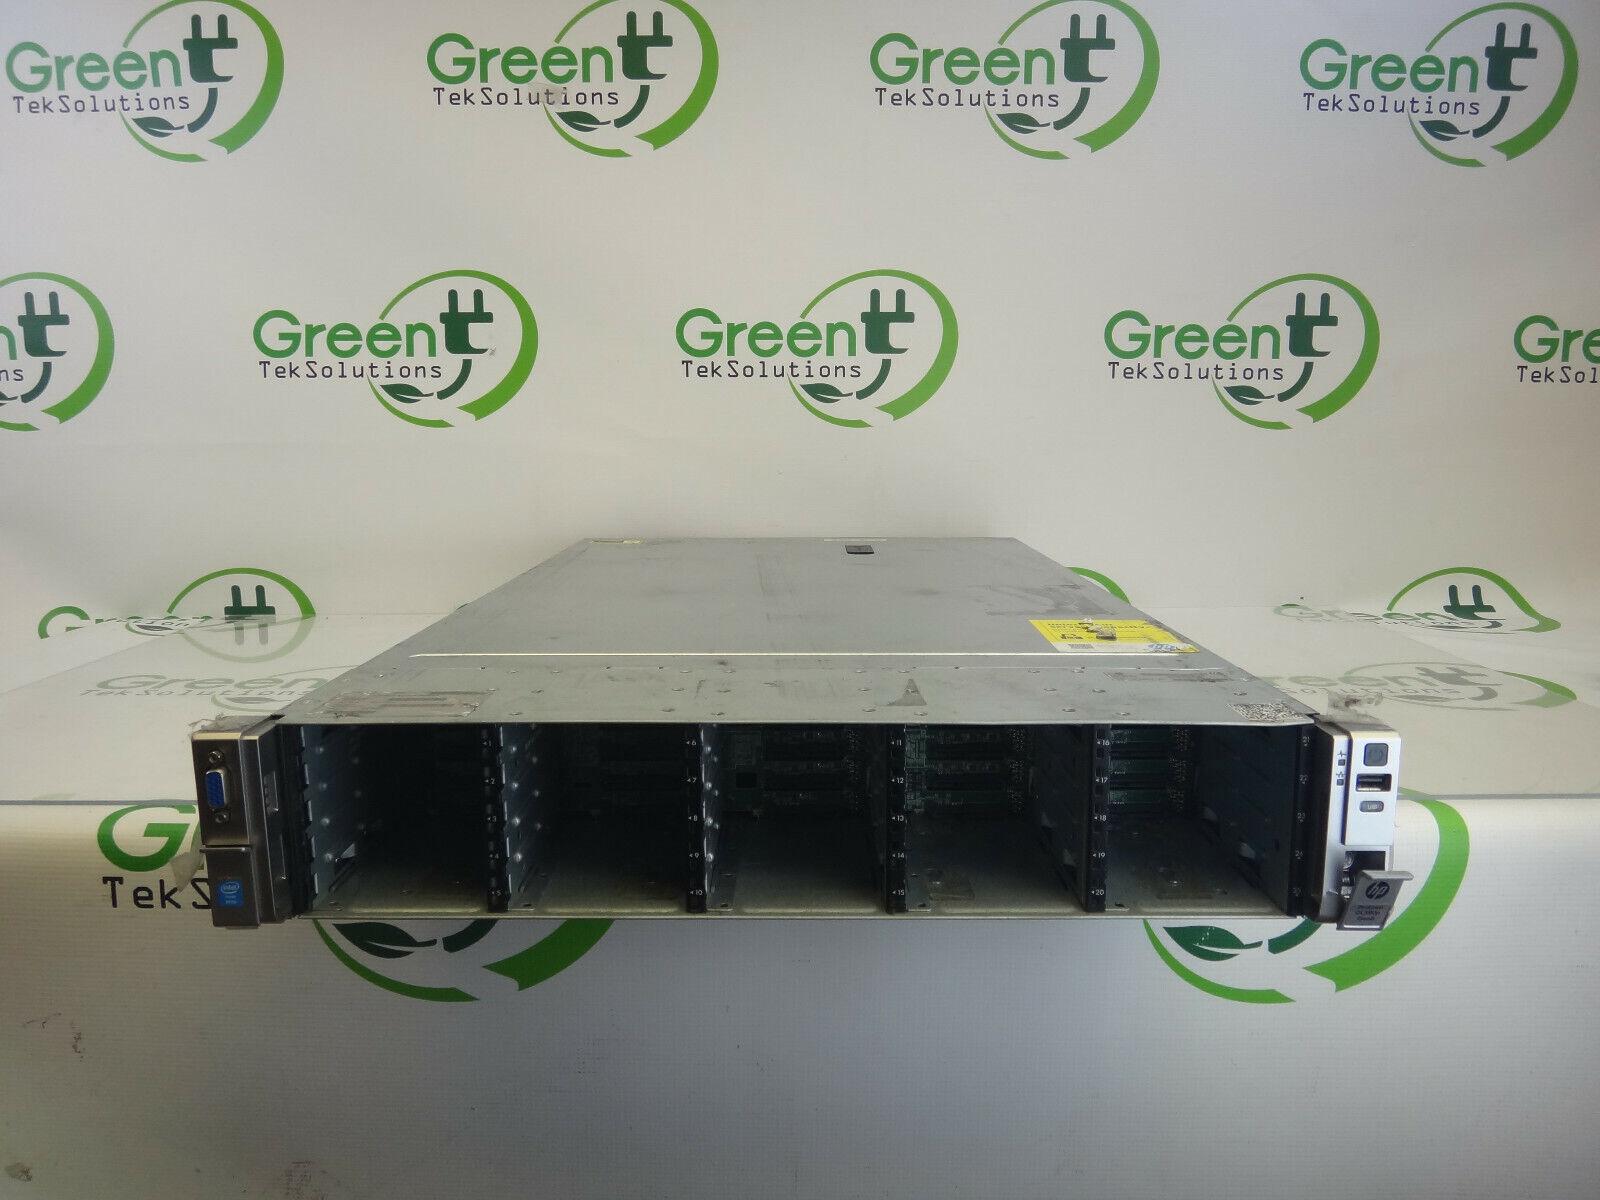 HP ProLiant DL360p G8 Server2x E5-2620 2.0GHz 64GB RAM RPSILO 12 Cores